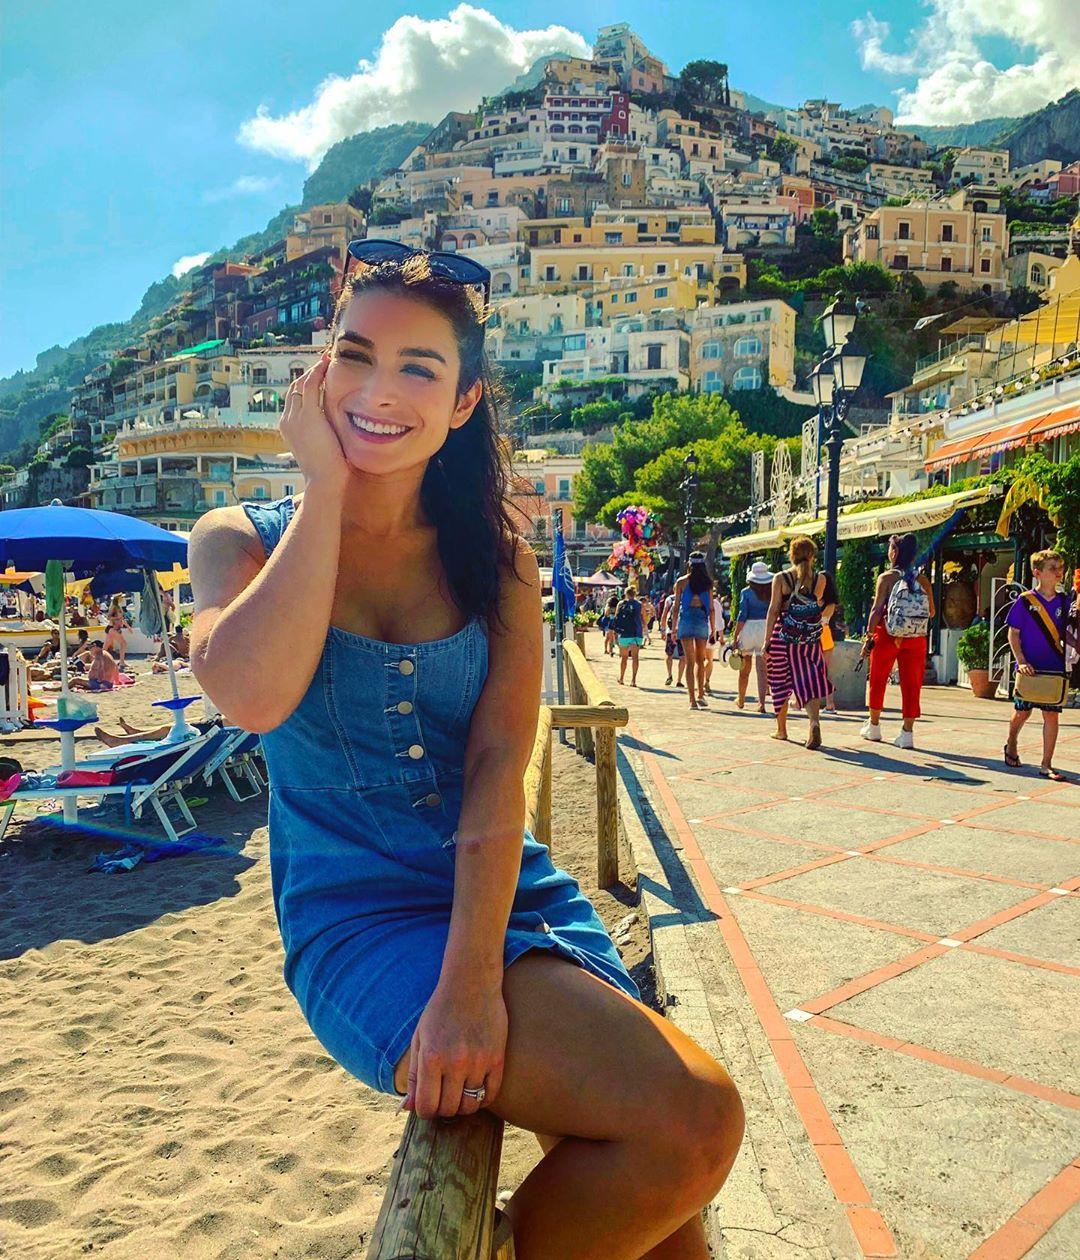 Ashley Iaconetti / Instagram